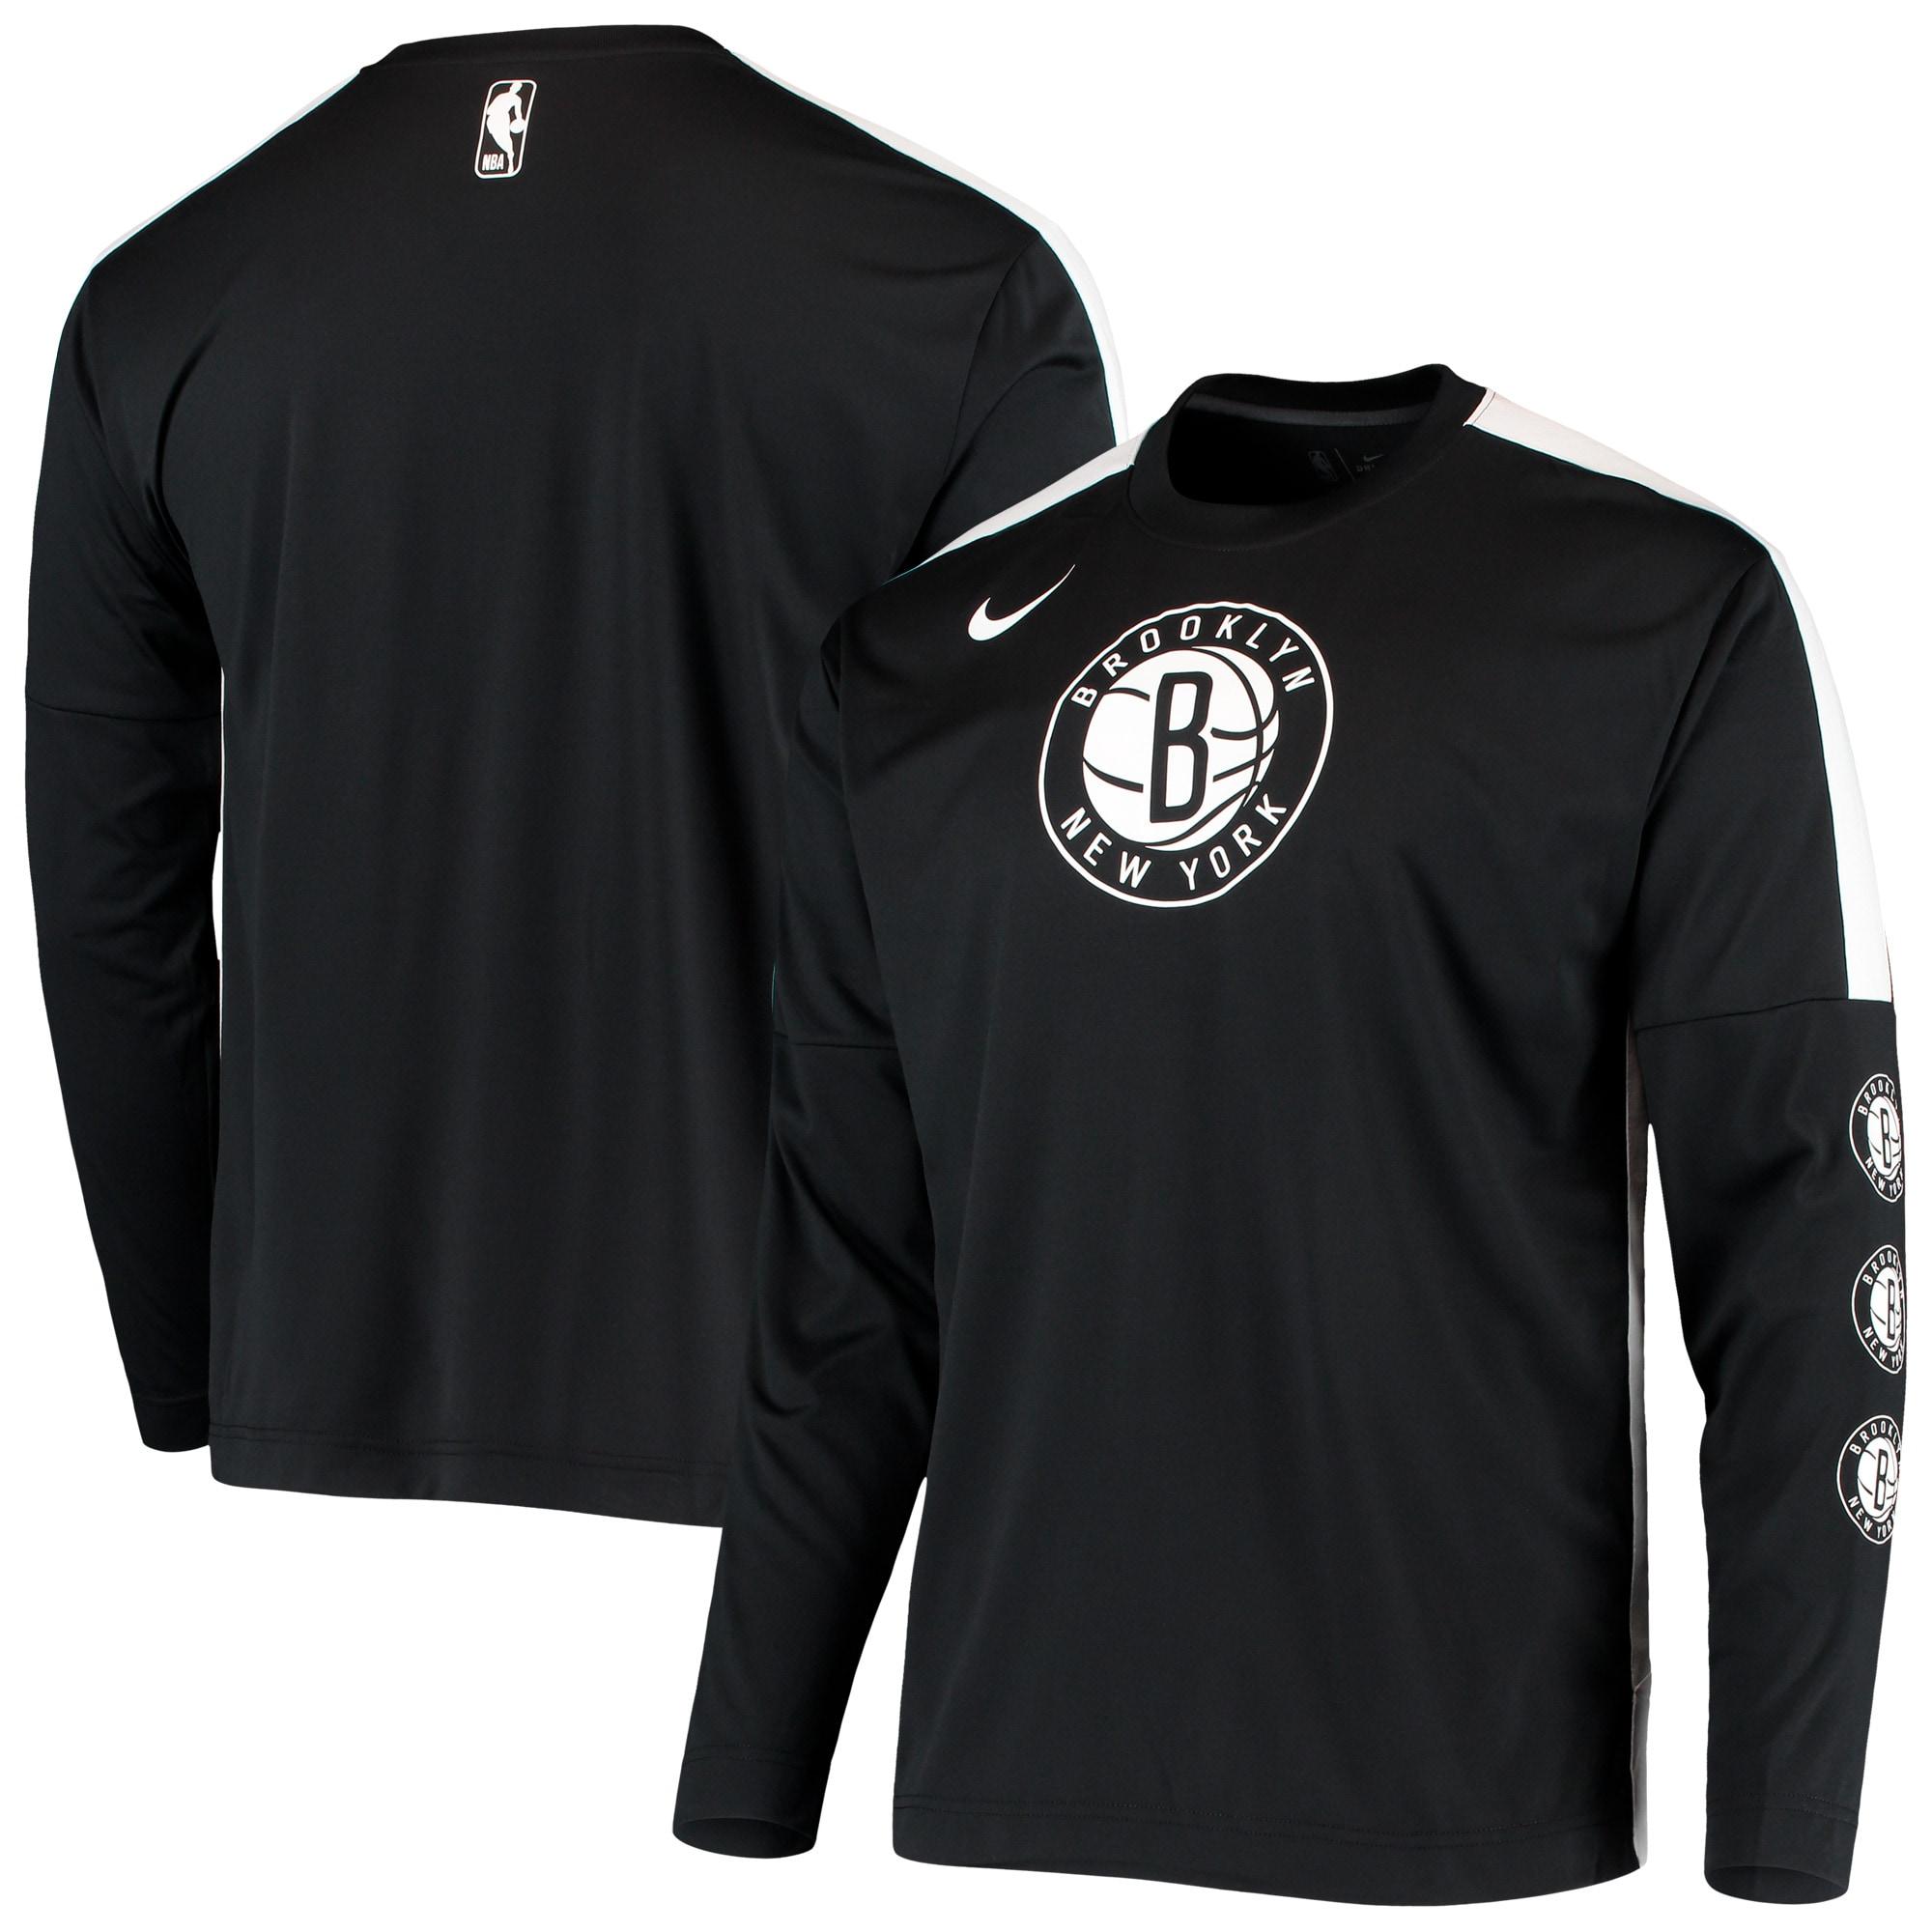 Brooklyn Nets Nike Long Sleeve Shooting Performance Shirt - Black